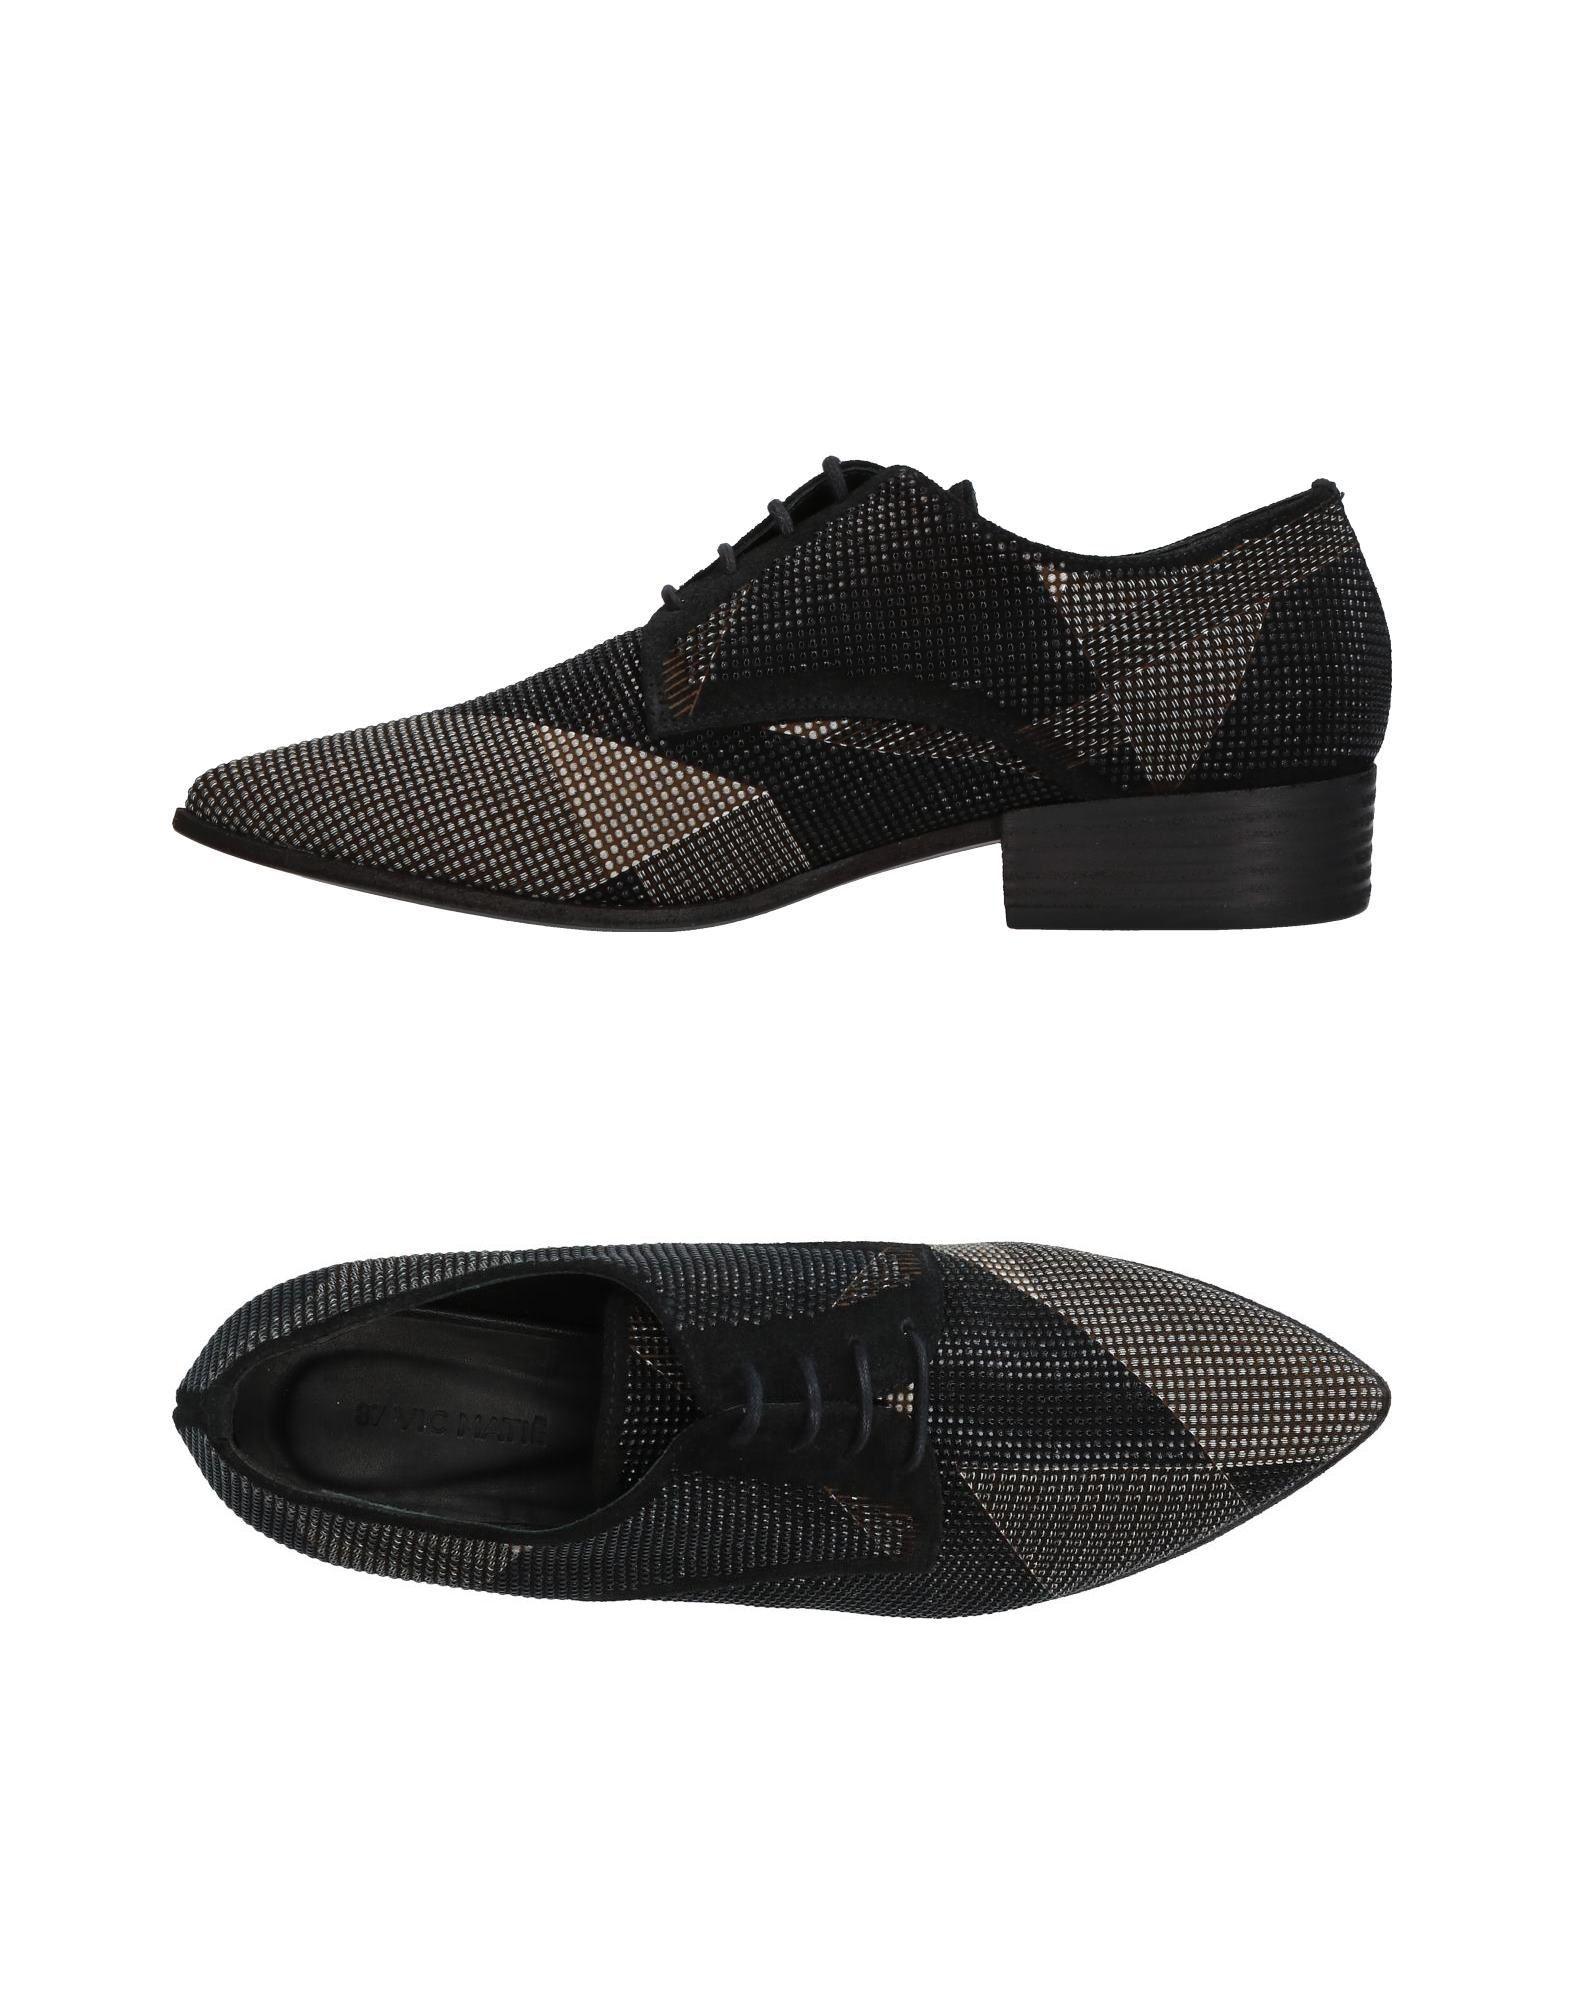 Chaussures - Chaussures À Lacets Ma Cocho sZPZZjo